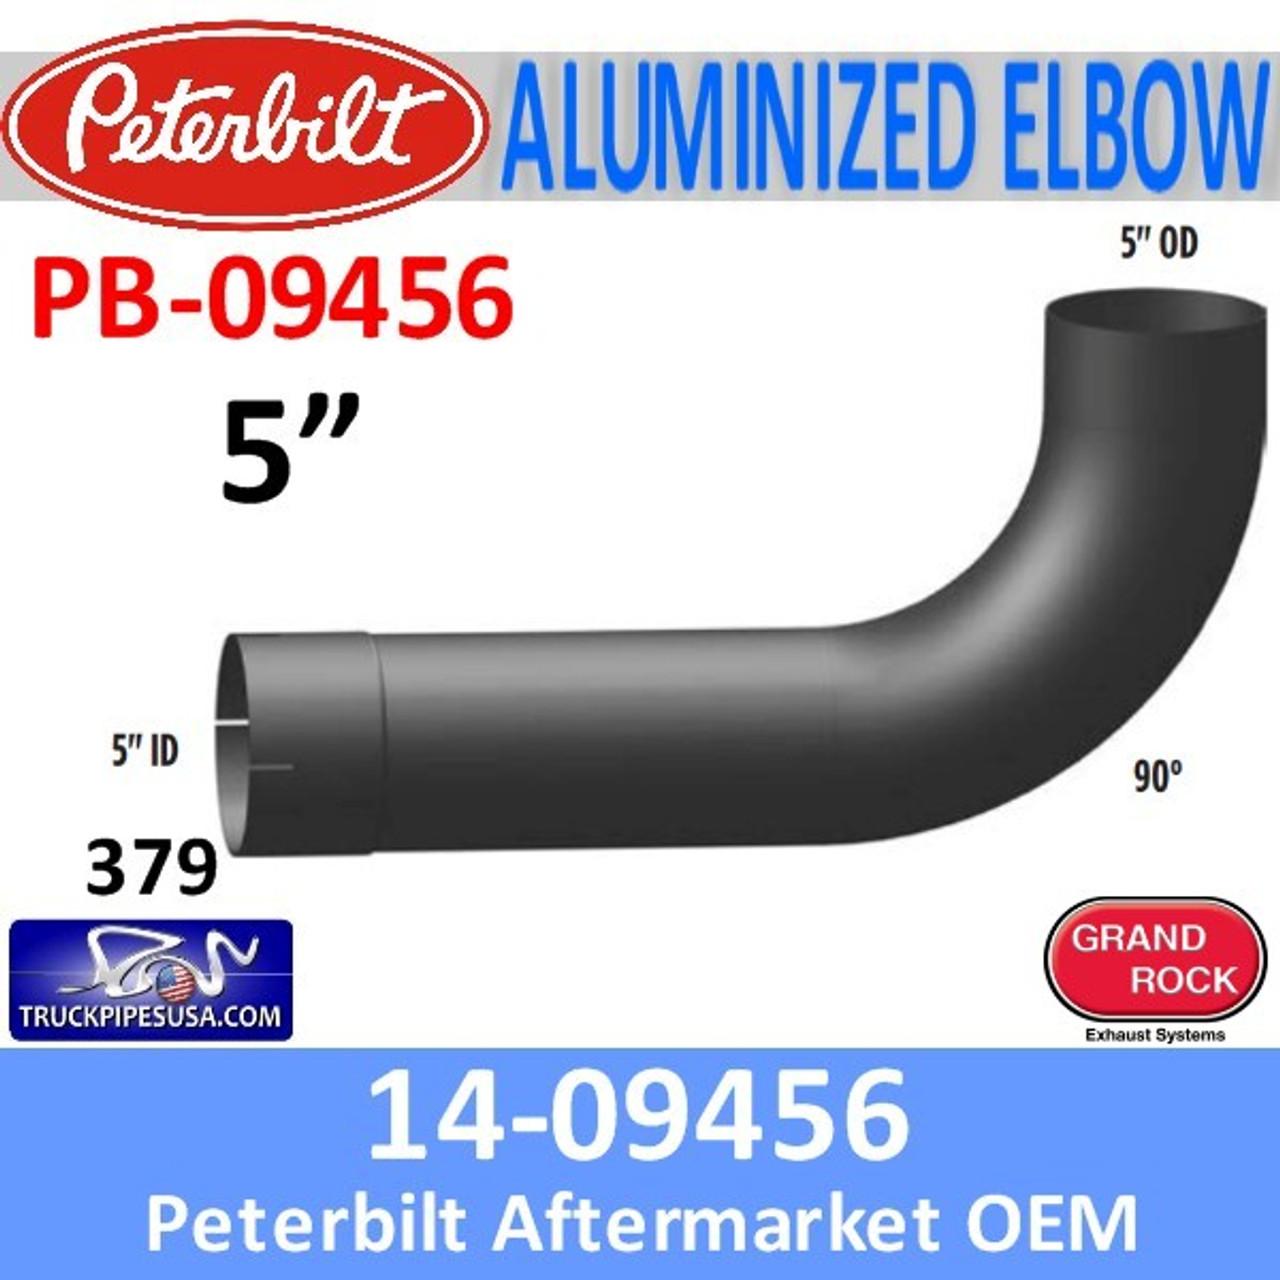 14-09456 Peterbilt 379 Exhaust 90 Degree Aluminized Elbow PB-09456